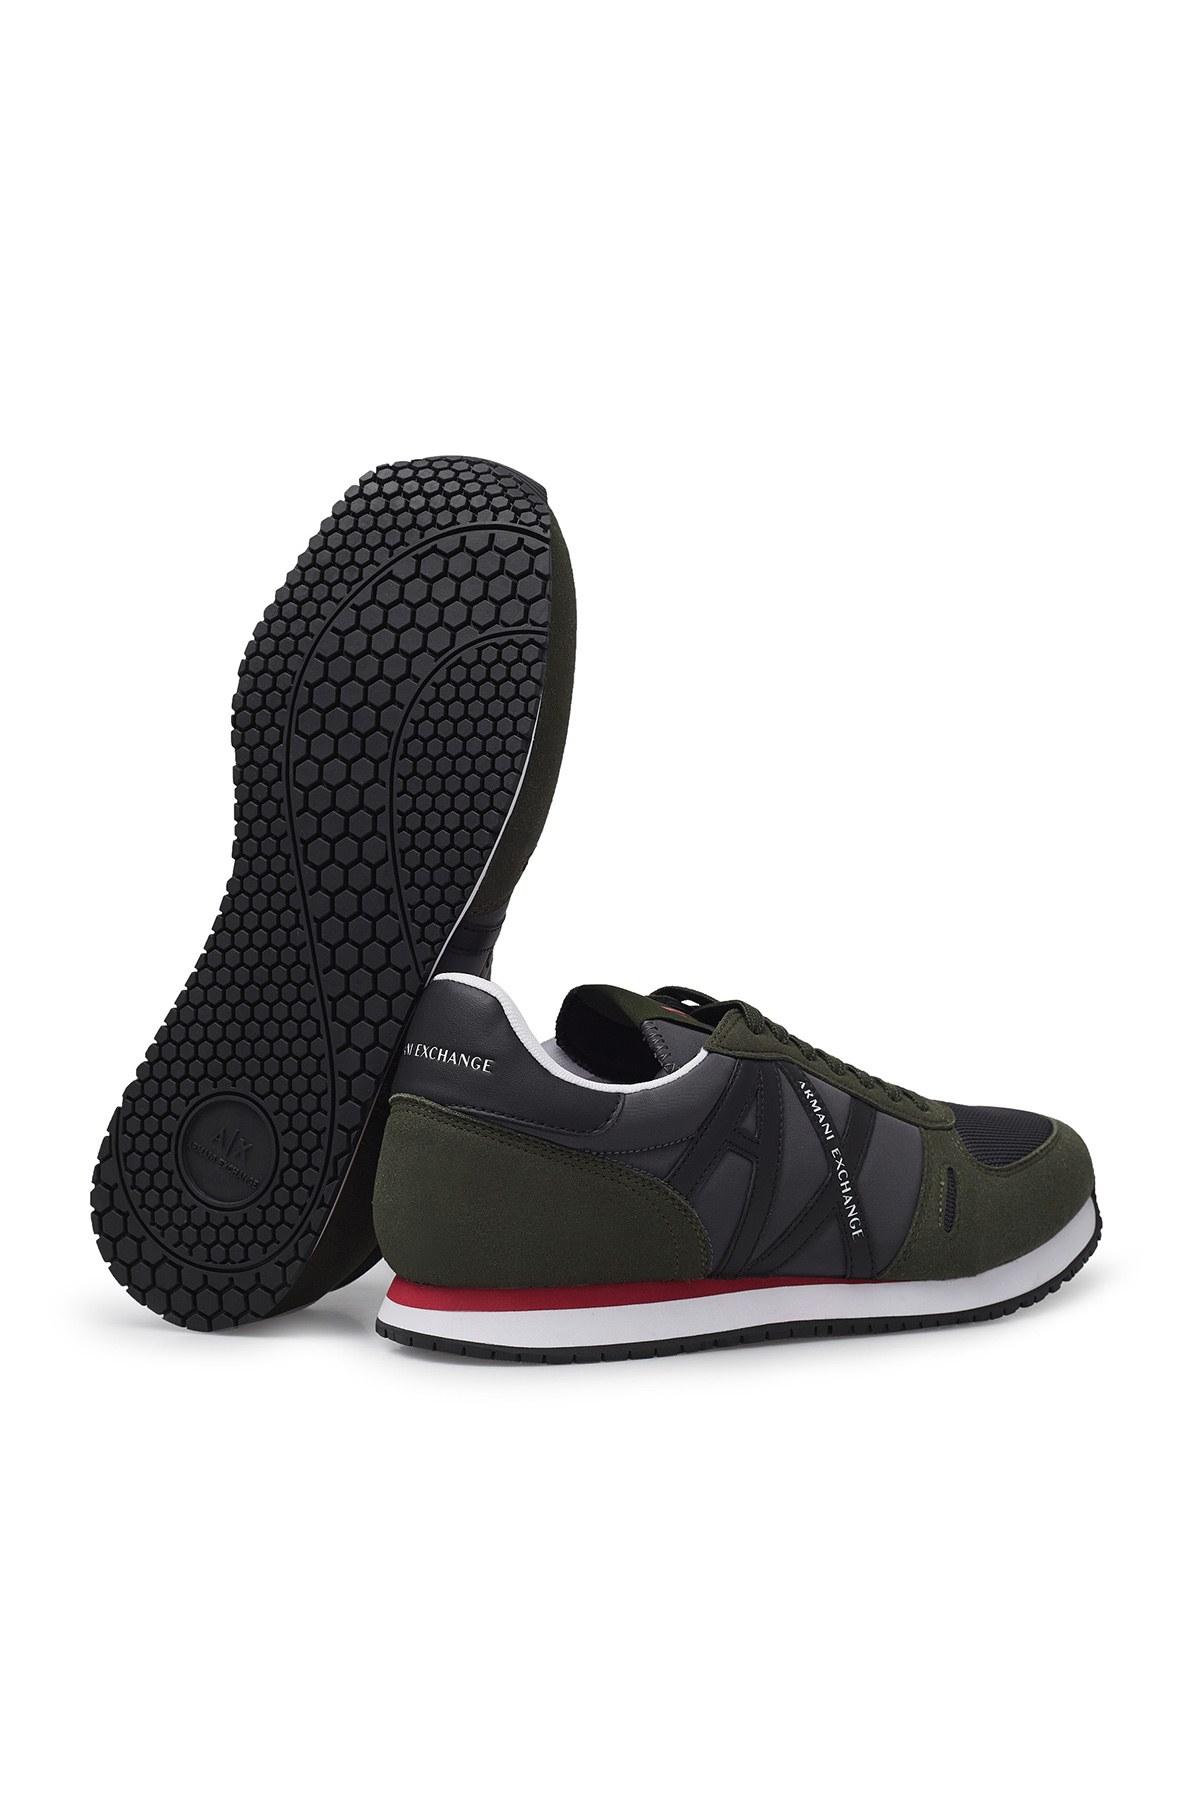 Armani Exchange Erkek Ayakkabı XUX017 XCC68 K498 HAKİ-SİYAH